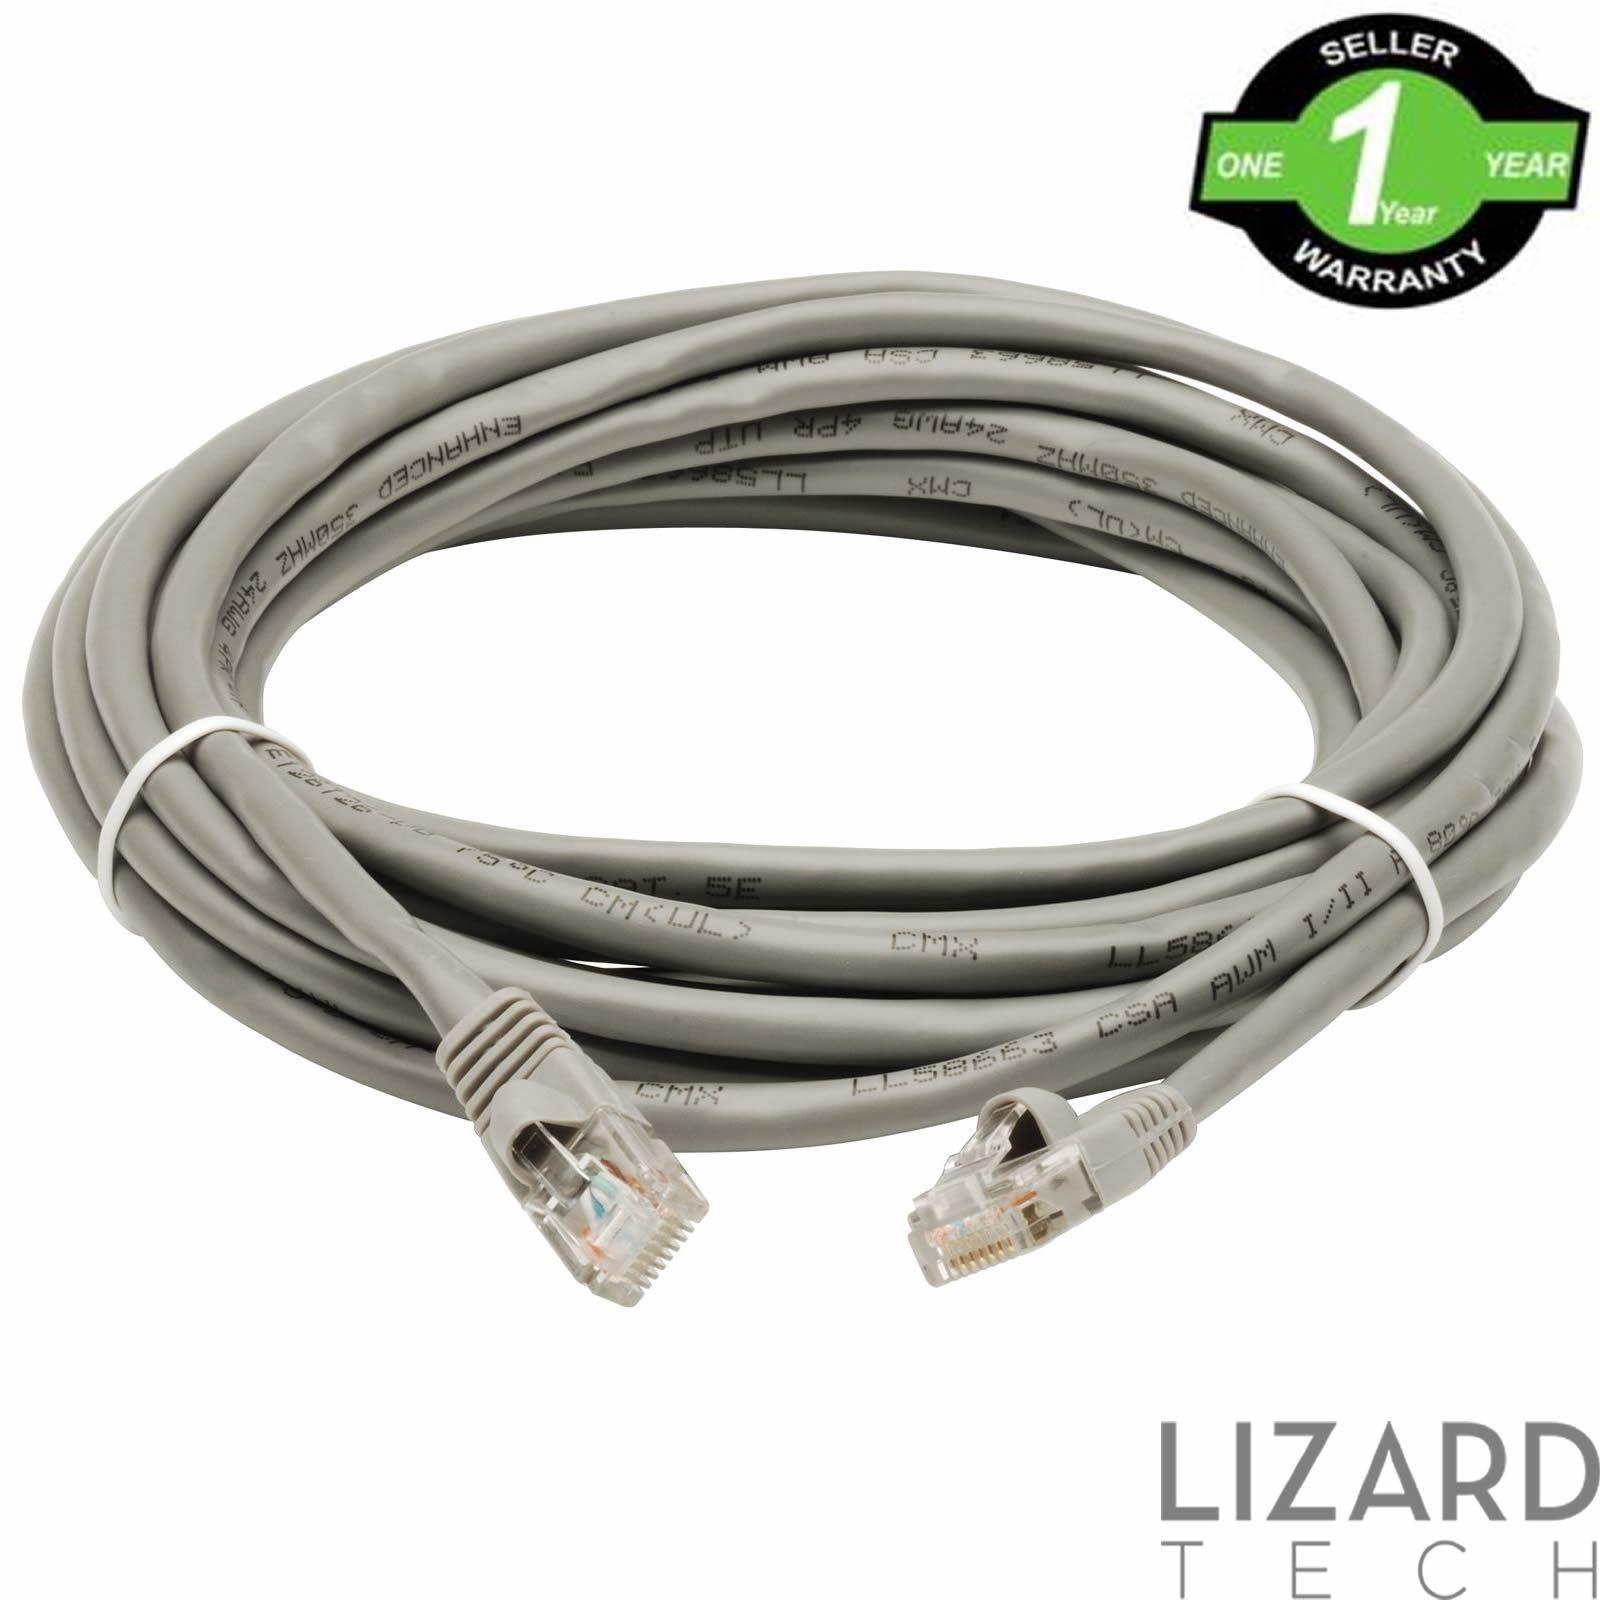 45 Metre Cat5e Ethernet Network Internet Rj45 Lan Cable How To Make Server